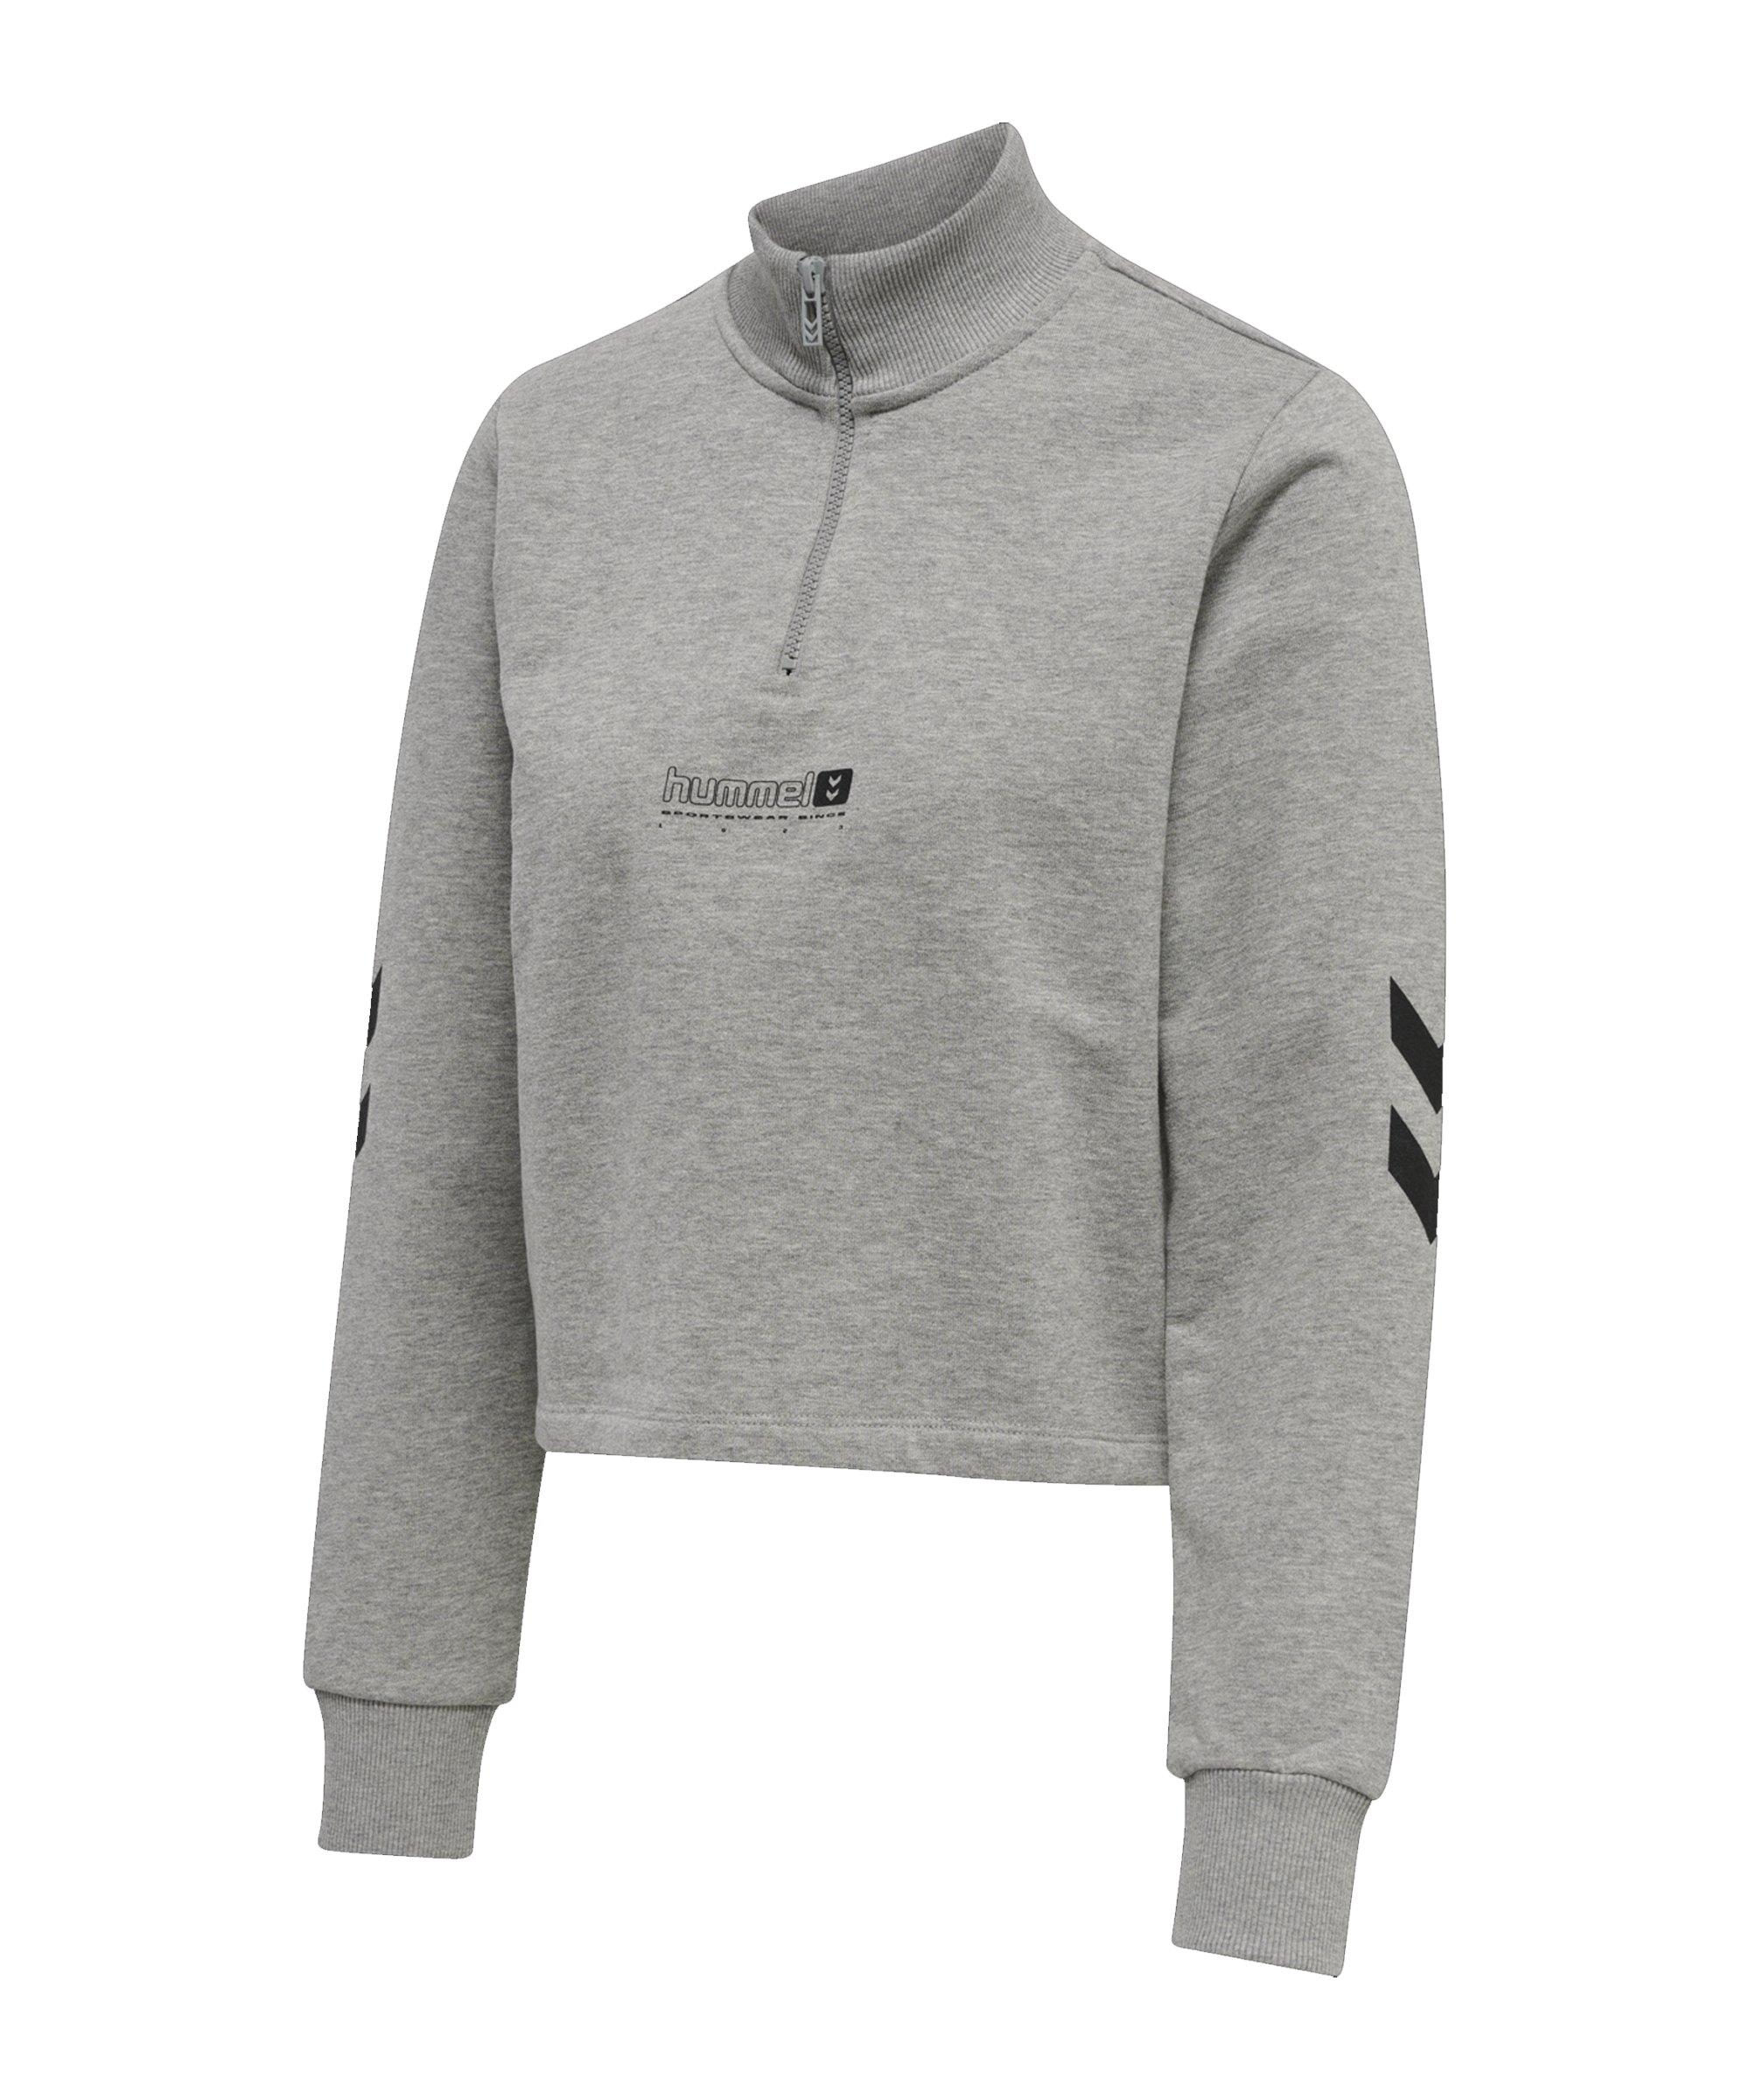 Hummel Nikka Cropped Sweatshirt Damen Grau F2006 - grau